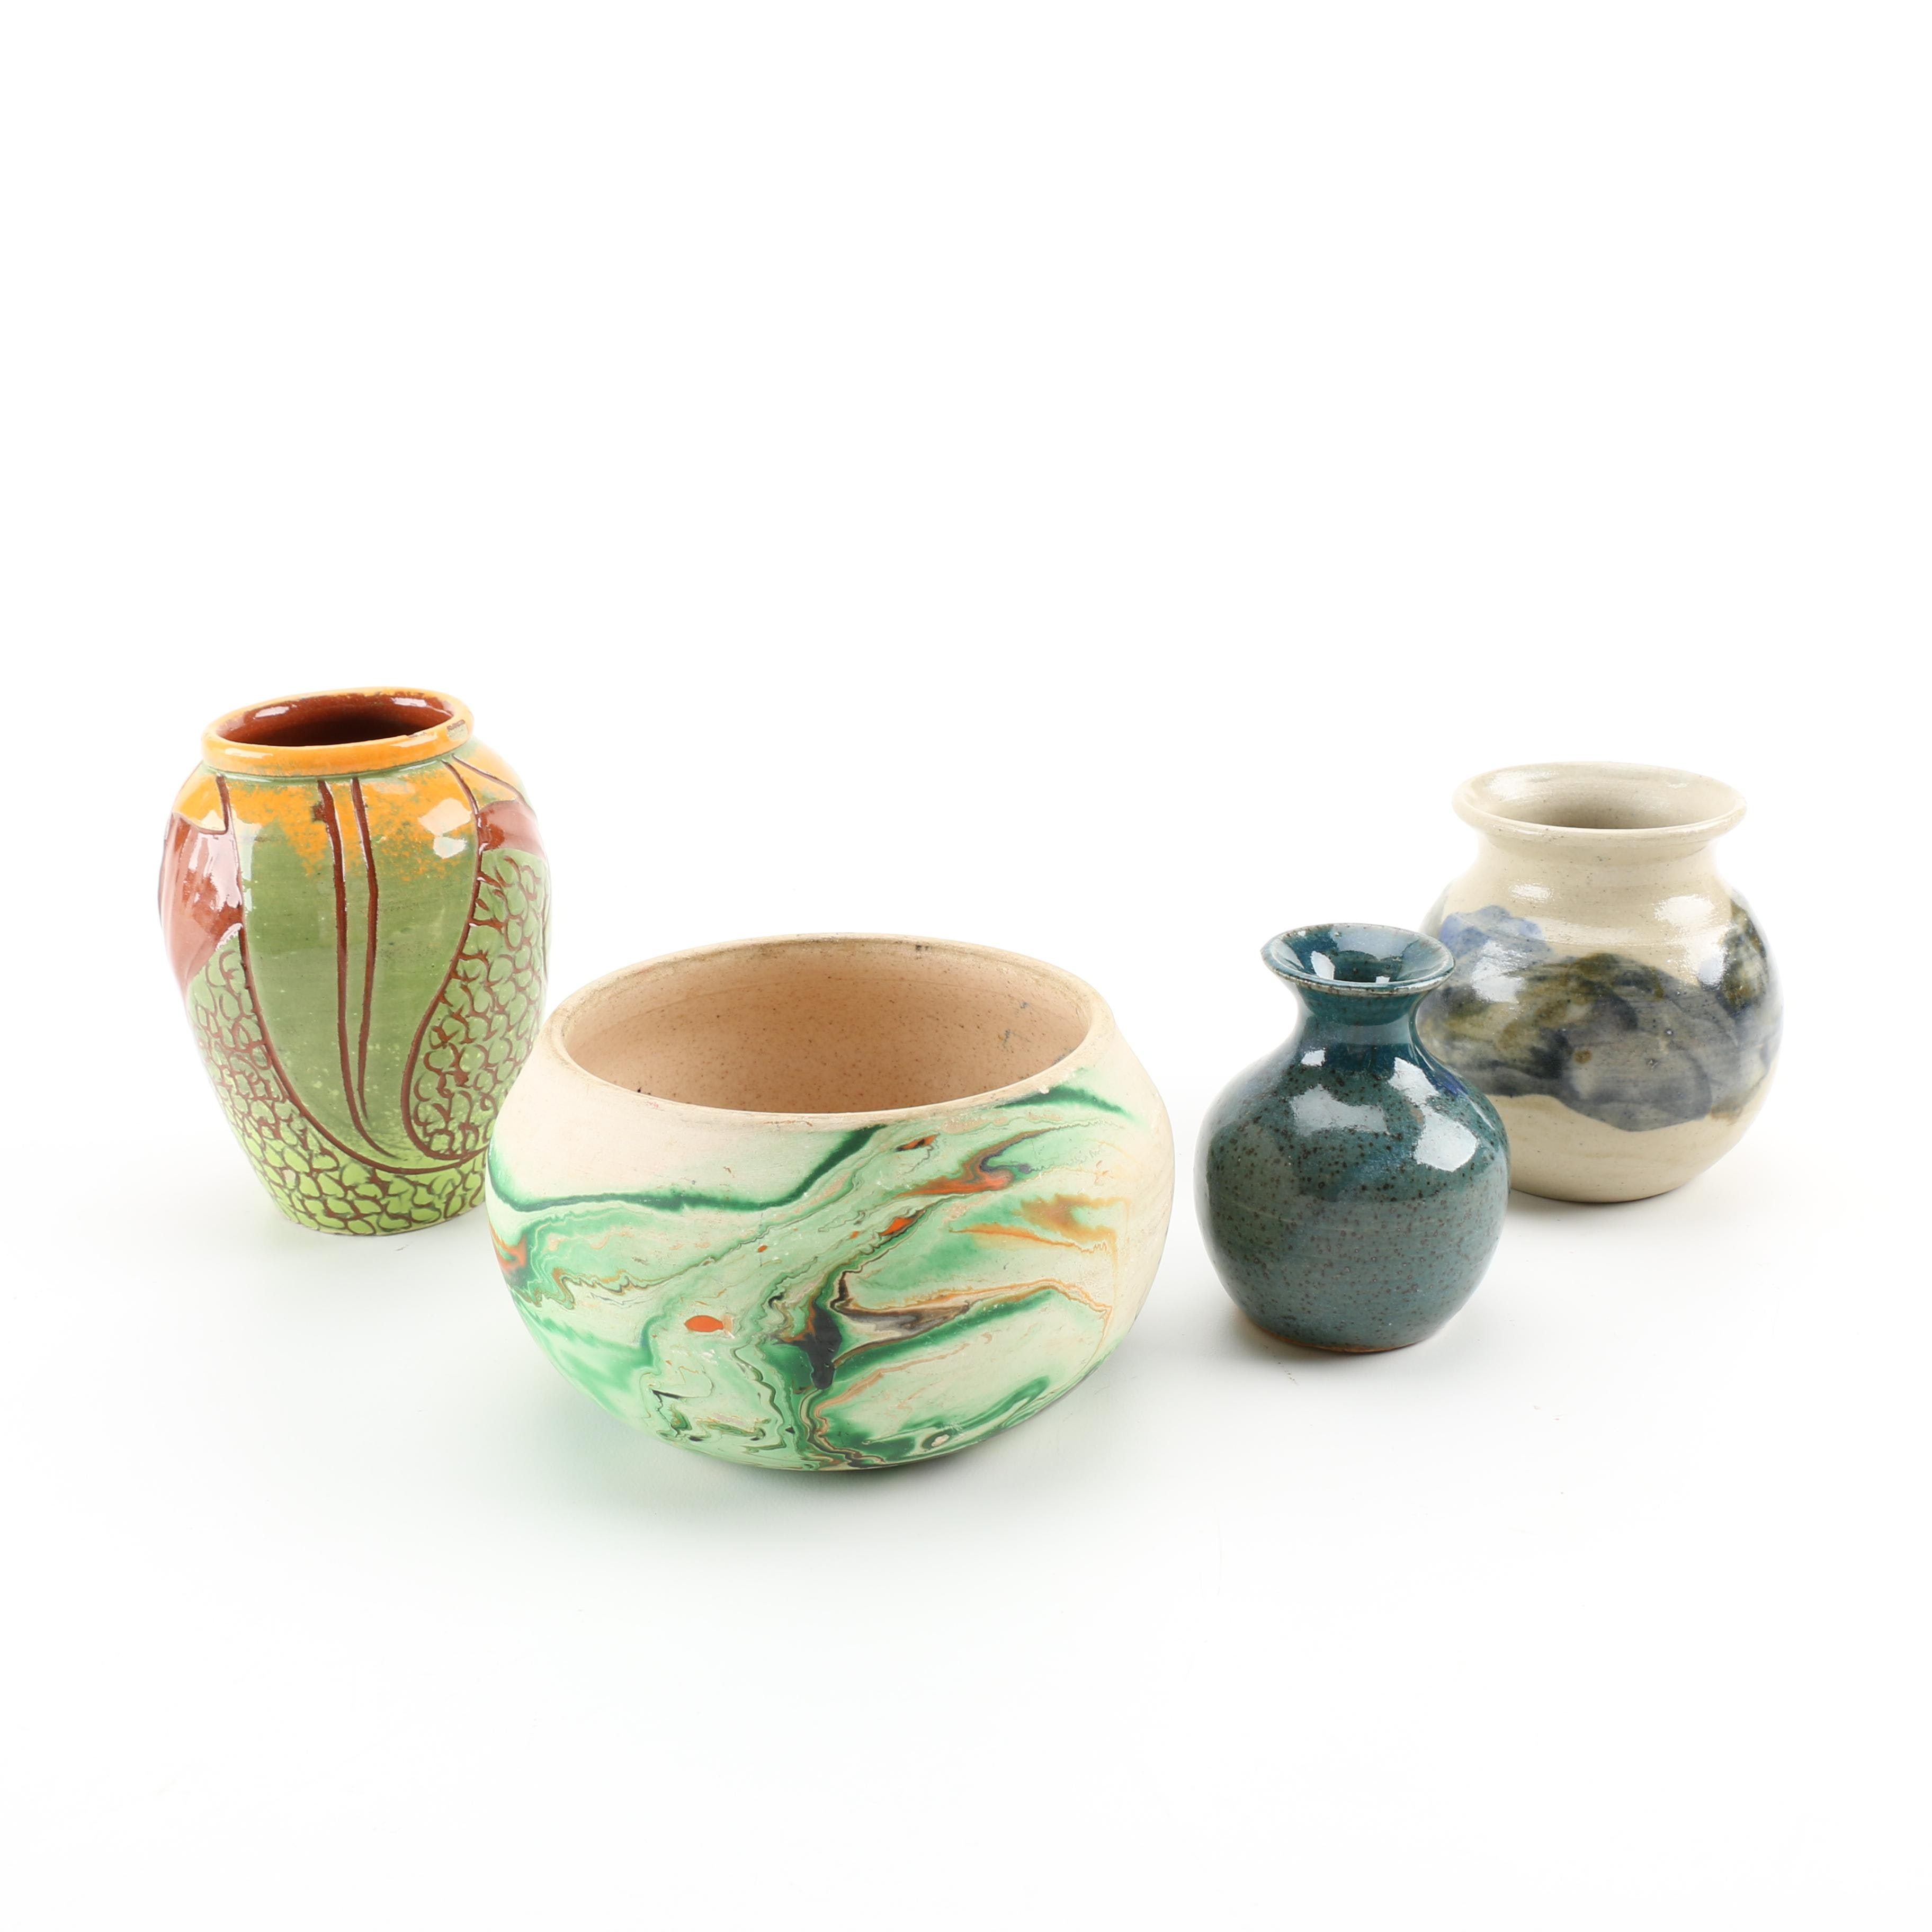 Art Pottery Vases Featuring Nemadji